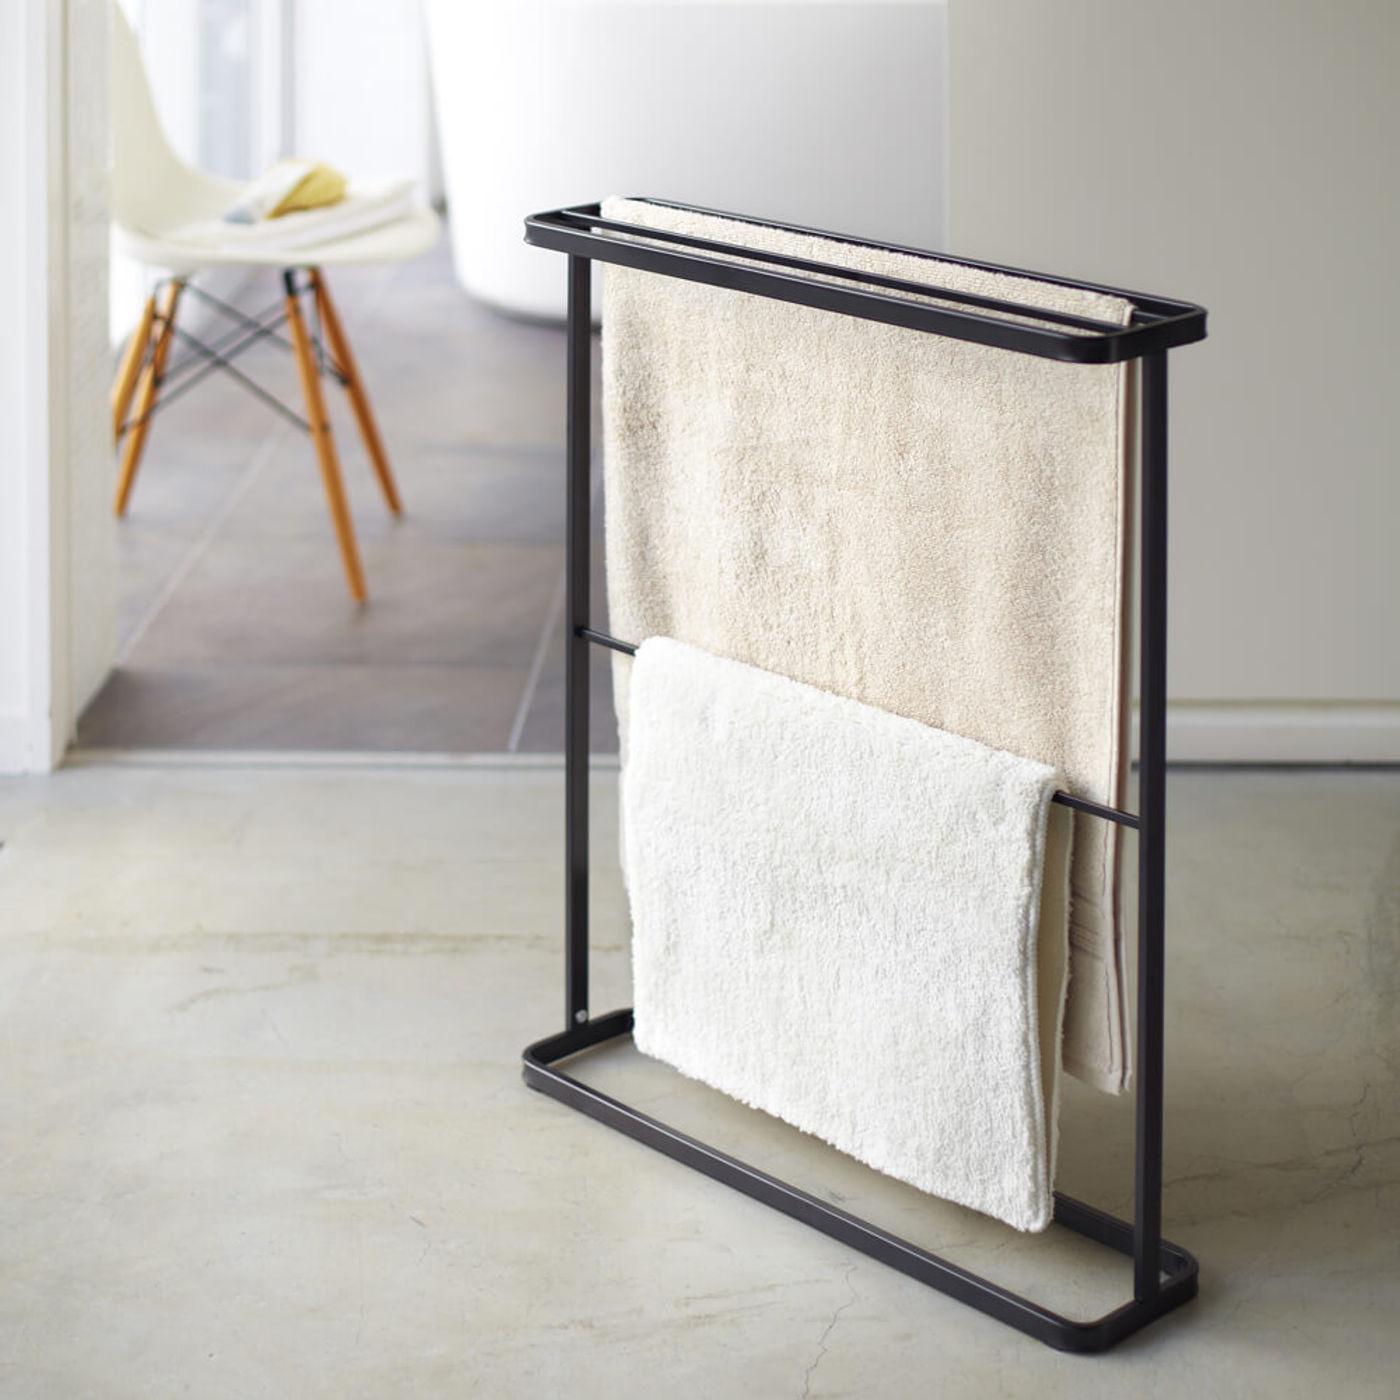 Black Tower Standing Bath Towel Hanger | Bombinate